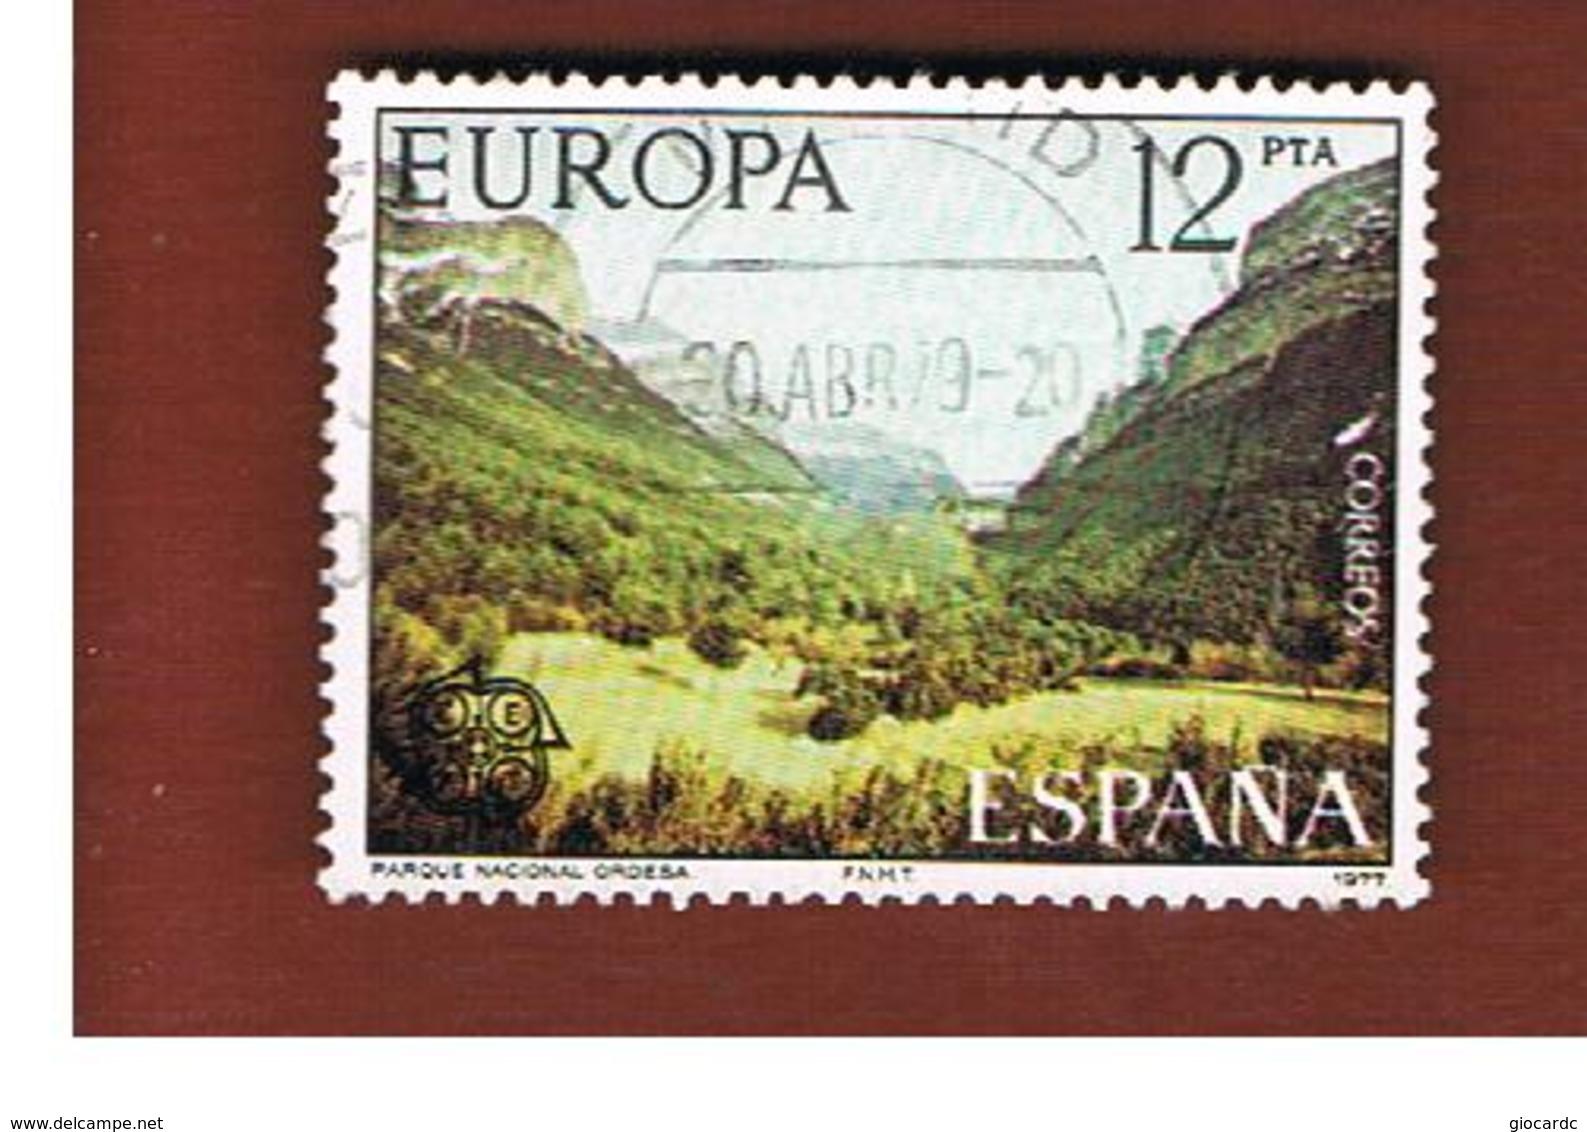 SPAGNA (SPAIN)  - 1977 EUROPA  - USED - 1977